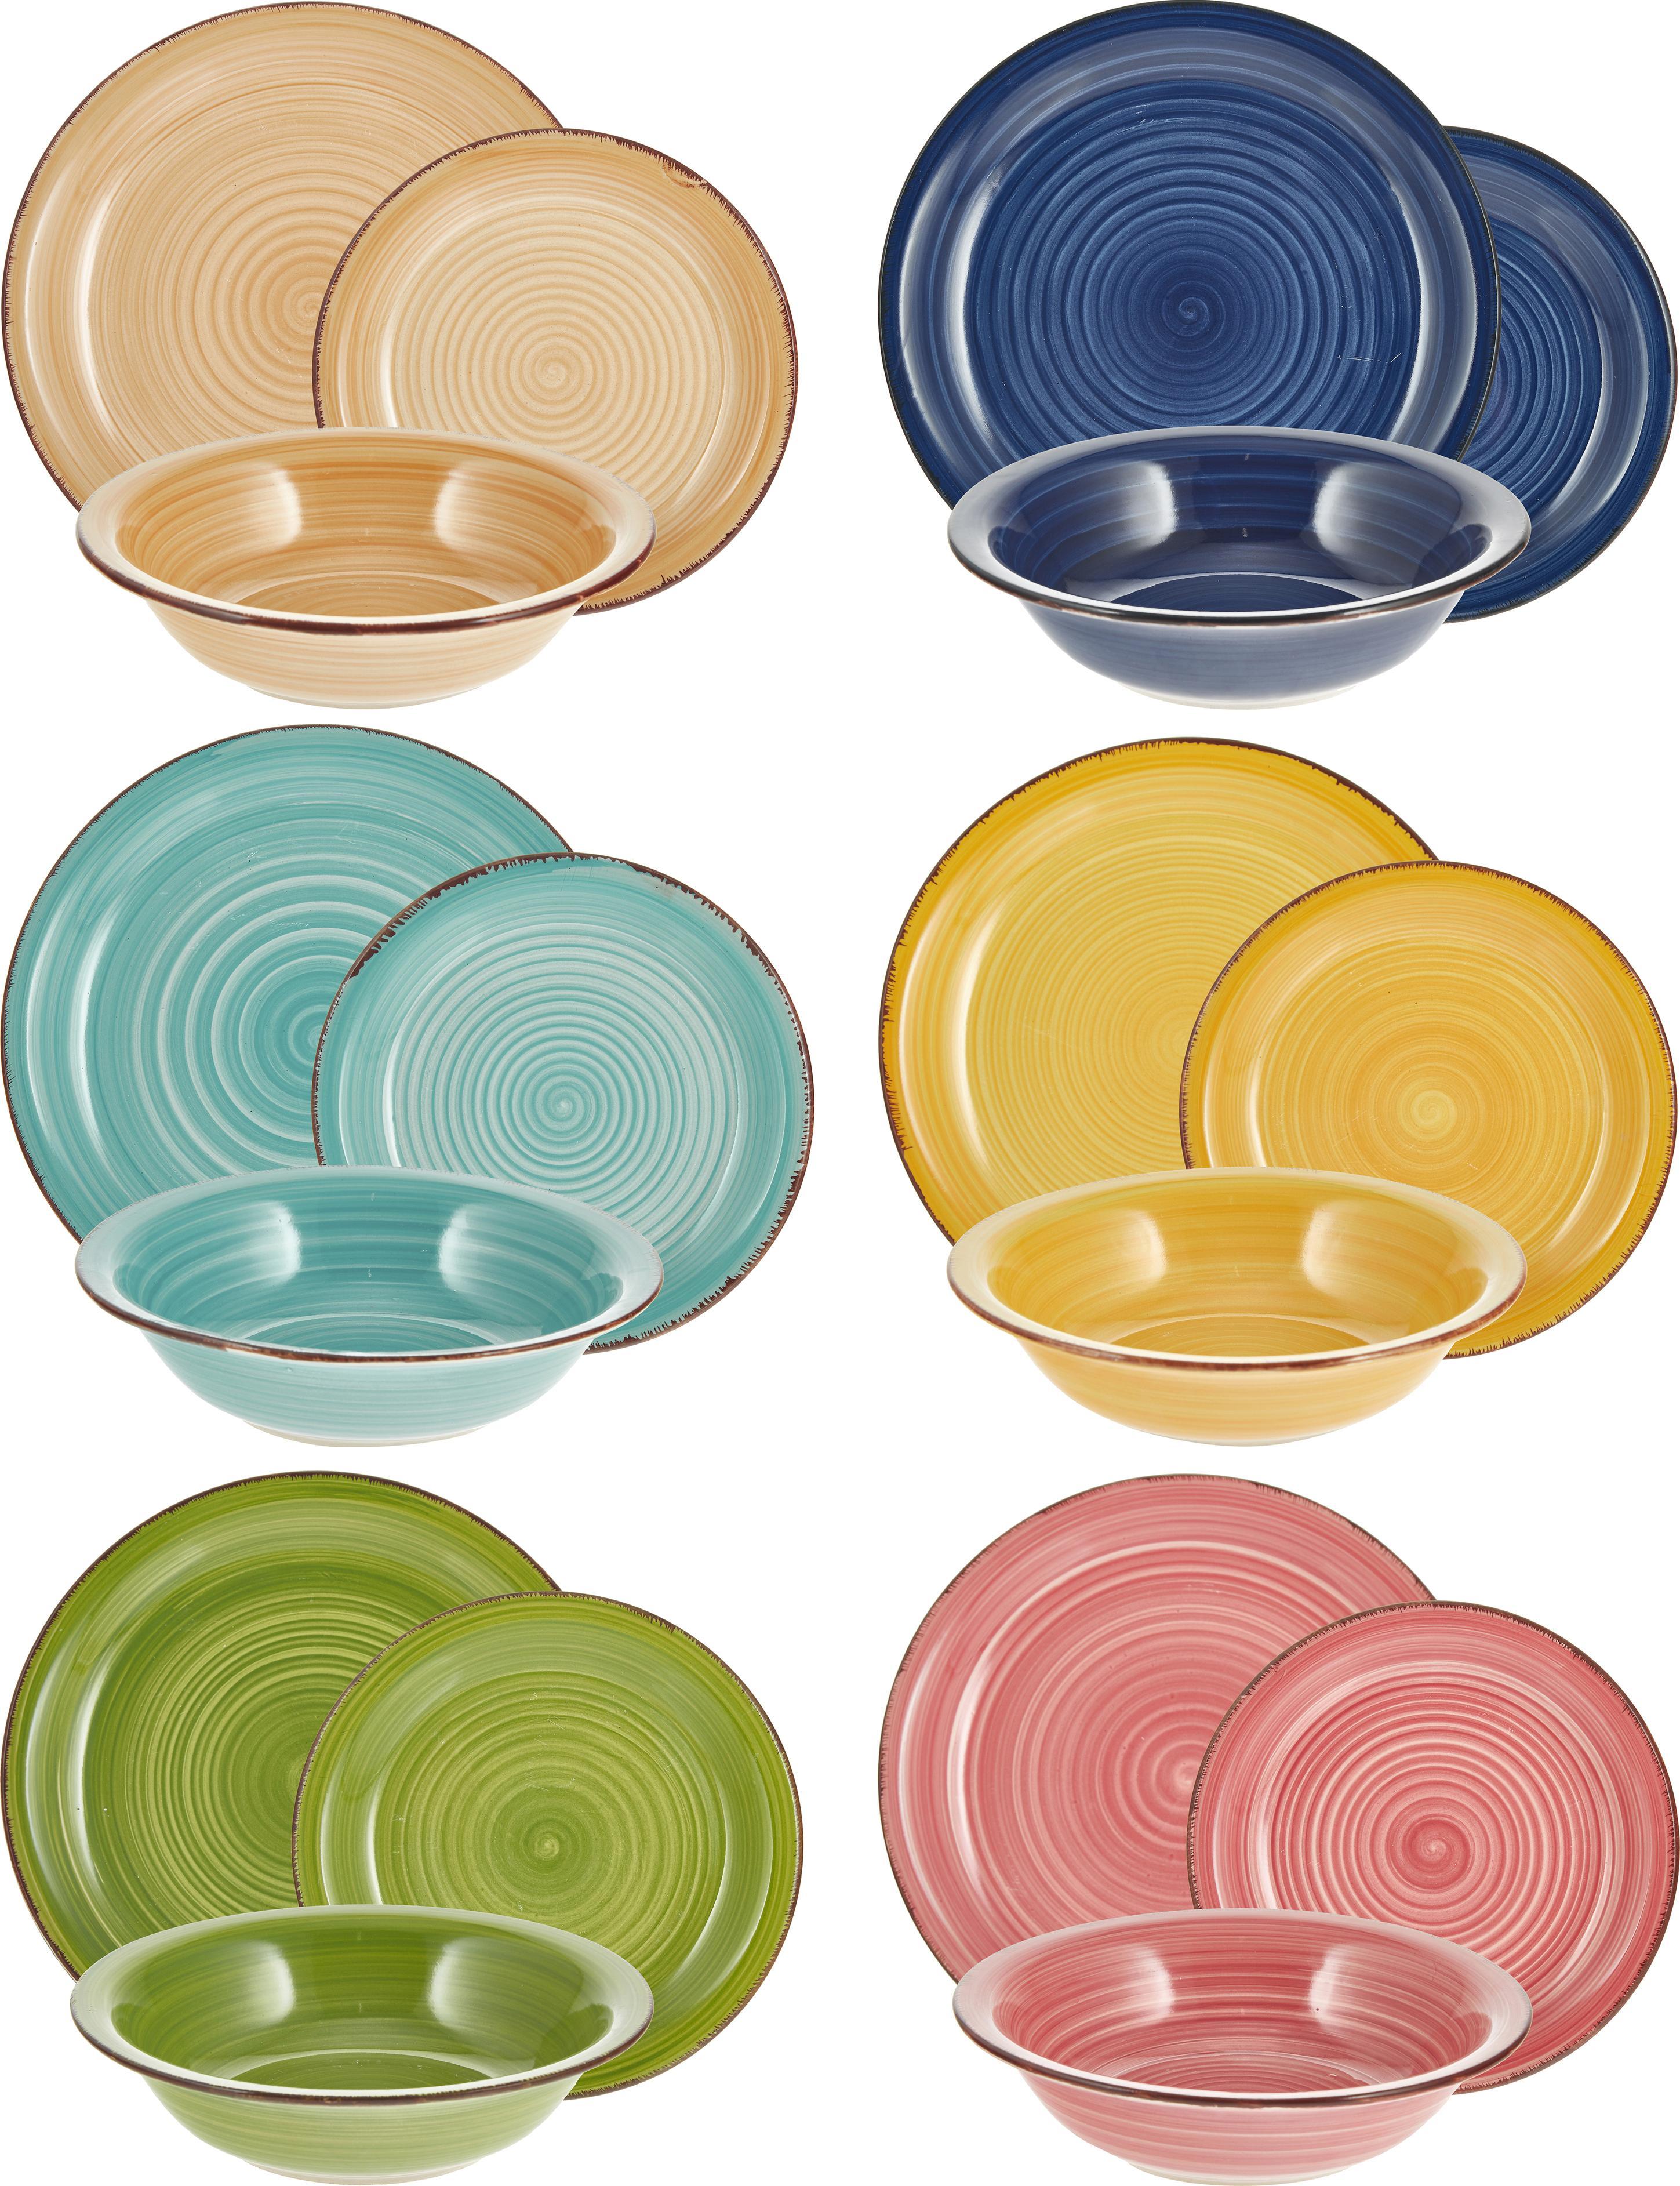 Vajilla artesanal Baita, 6comensales (18pzas.), Gres (dolomita) pintadoamano, Azul oscuro, rojo, verde, turquesa, amarillo, naranja claro, Set de diferentes tamaños